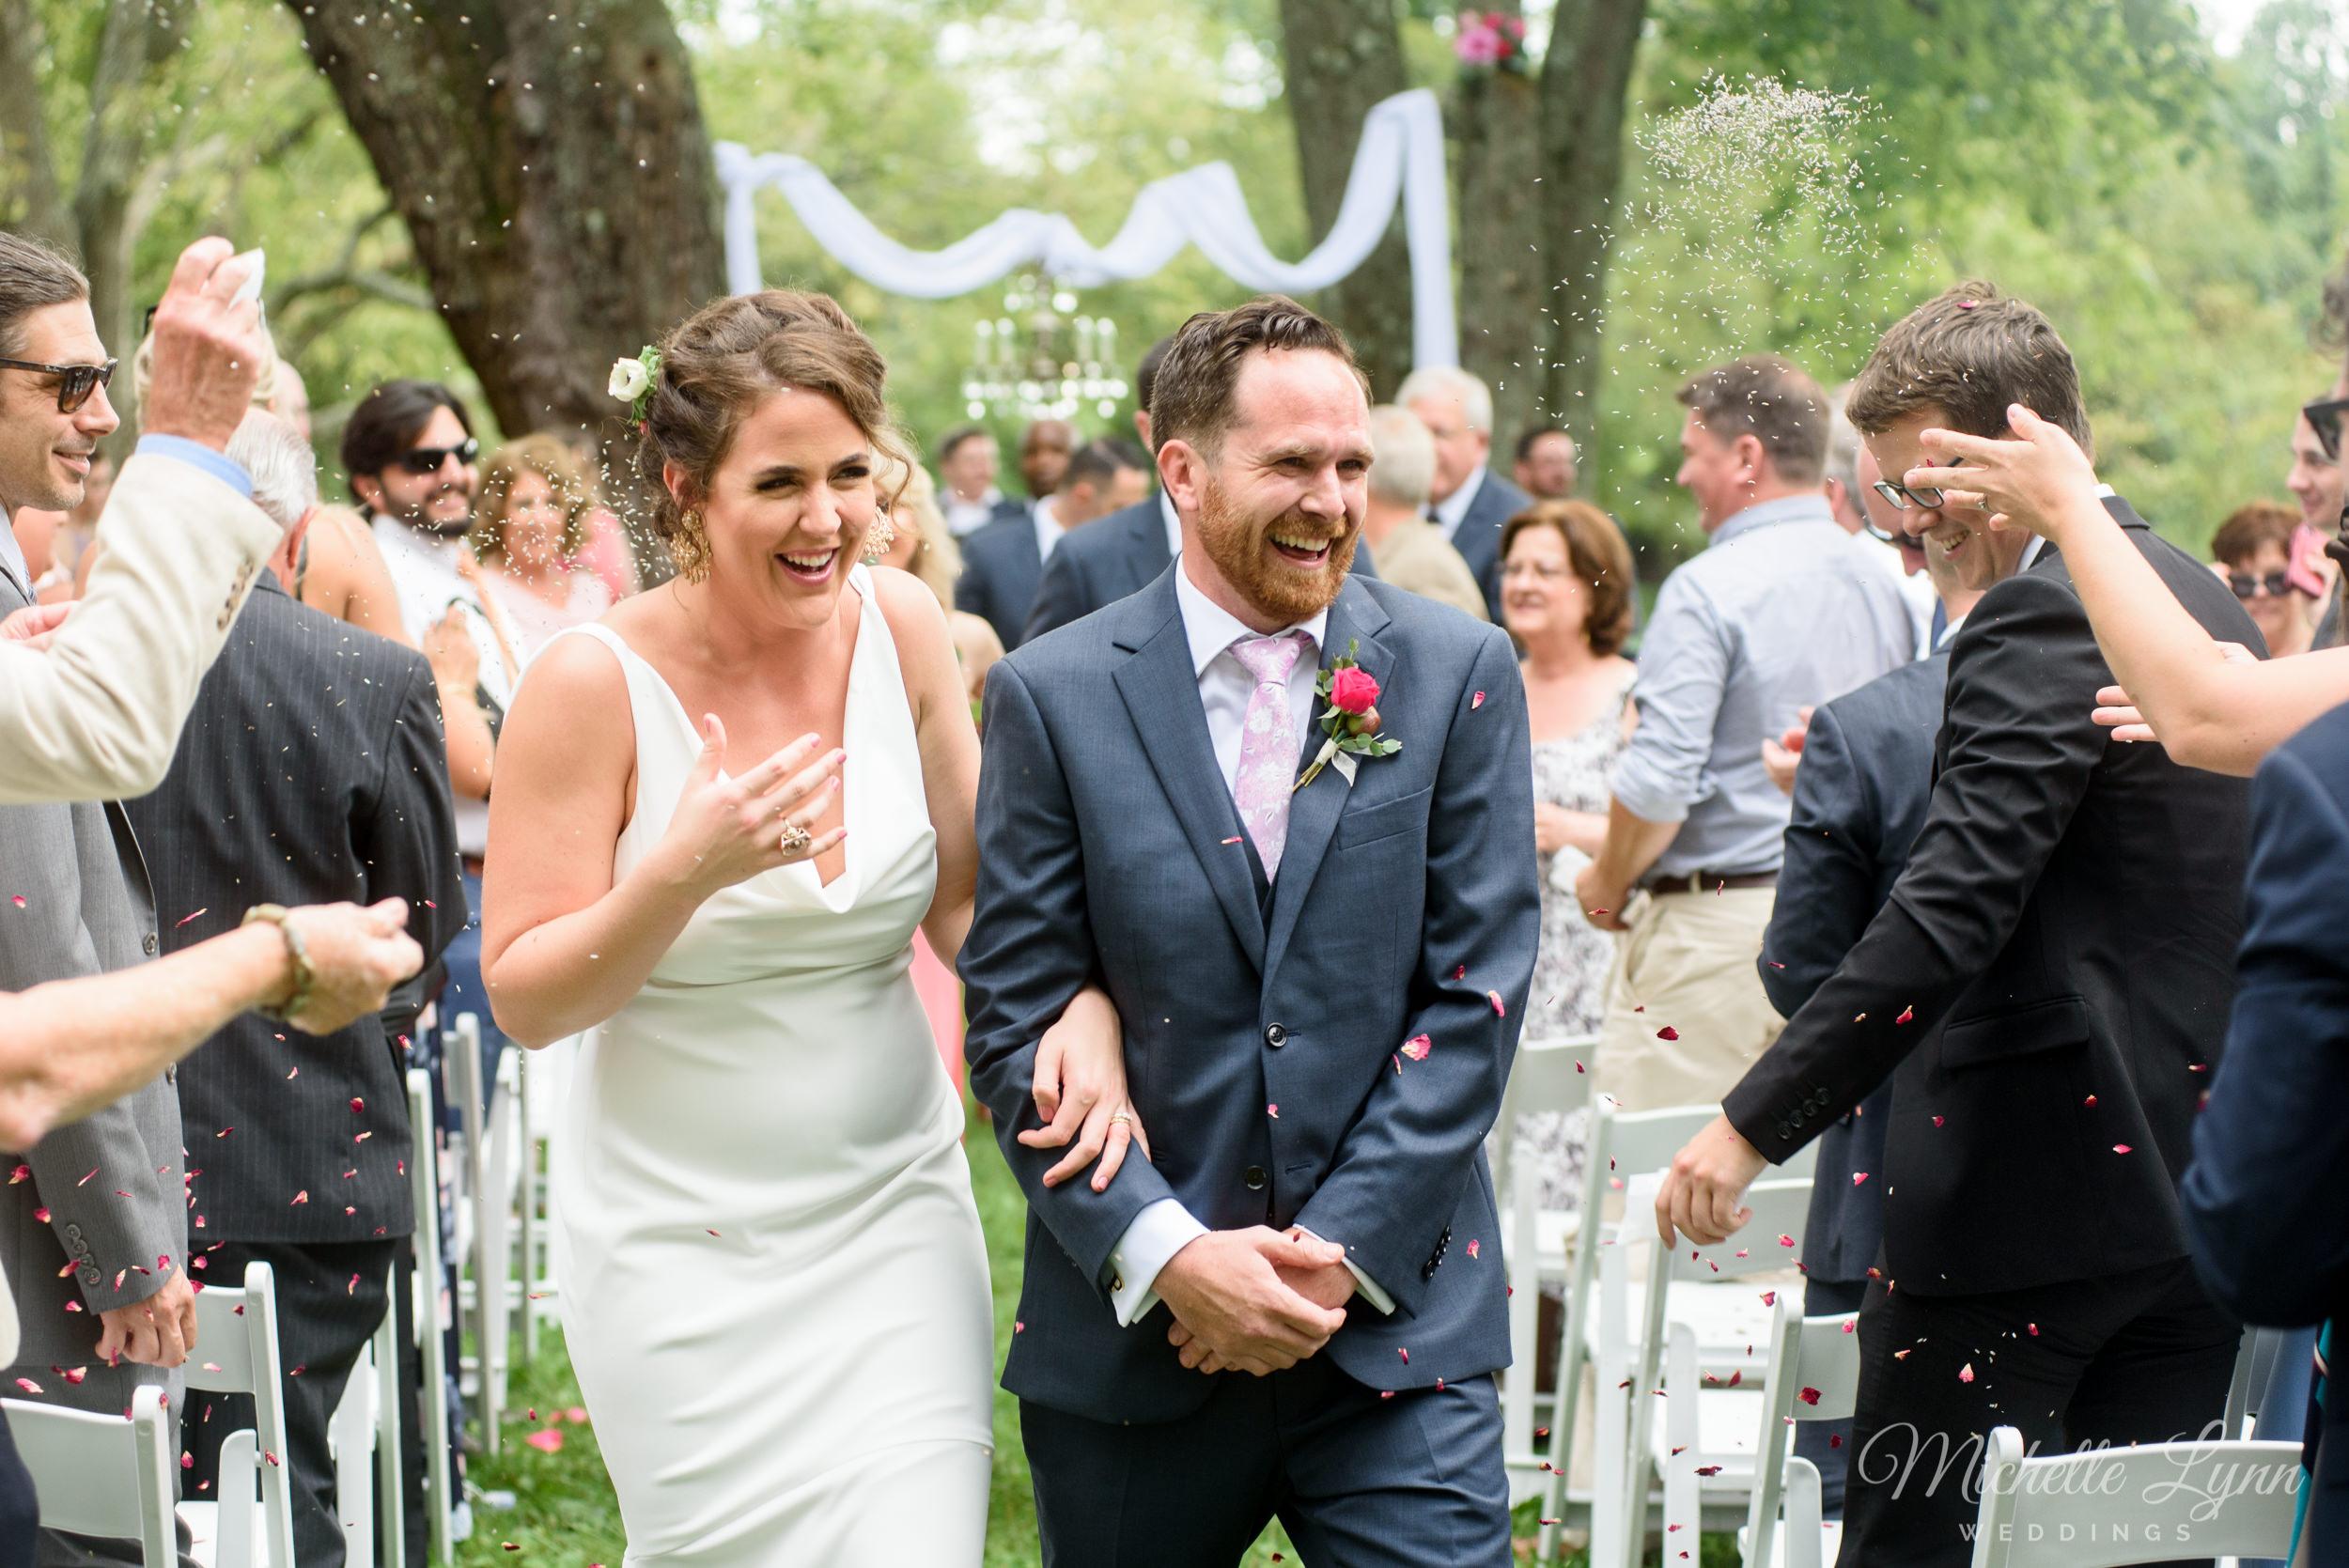 mlw-unionville-vineyards-nj-wedding-photography-48.jpg